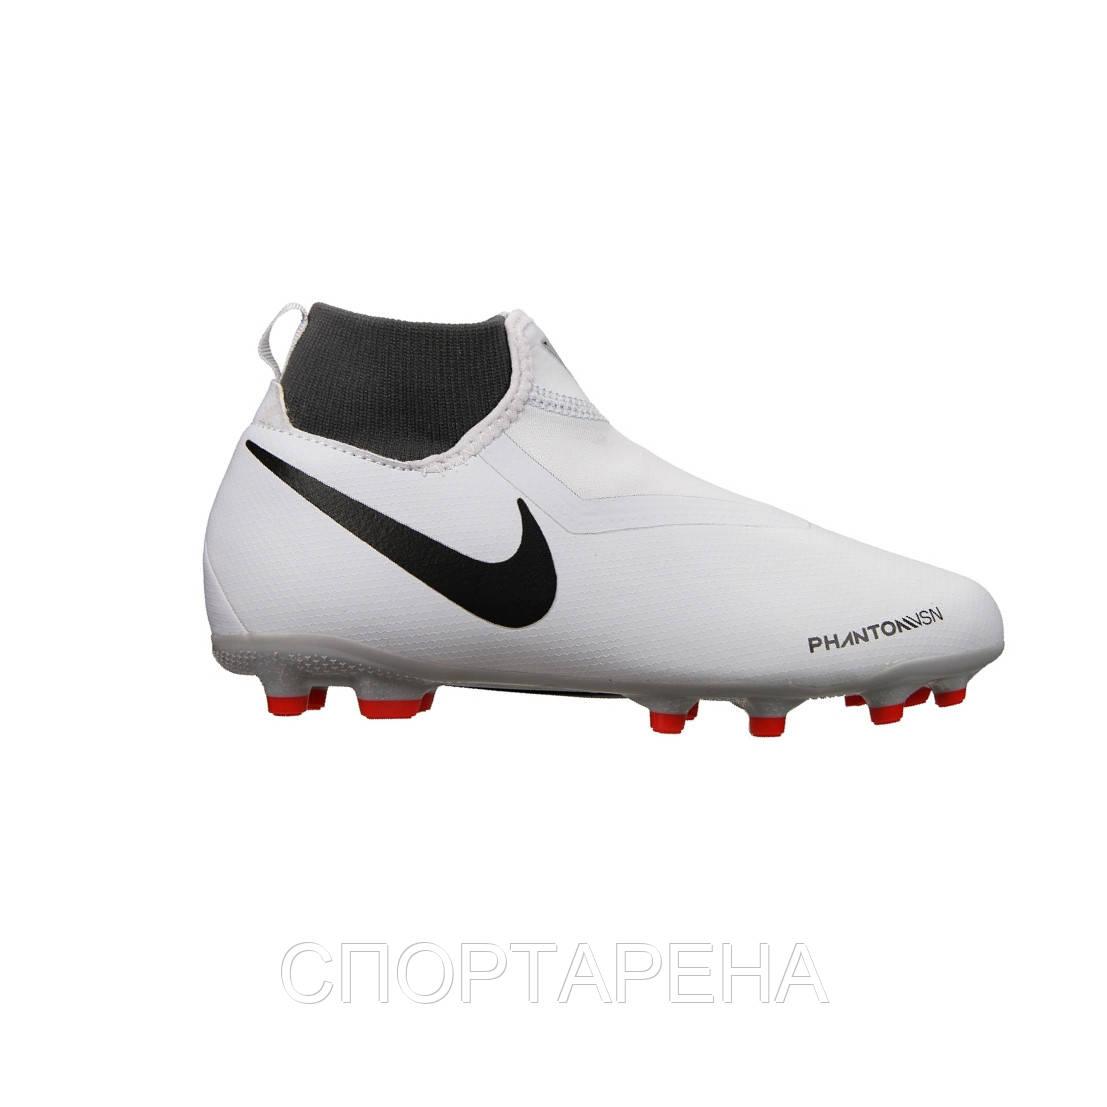 081a27e0 Детские бутсы Nike JR Phantom Vsn DF MG AO3287-060: продажа, цена в ...